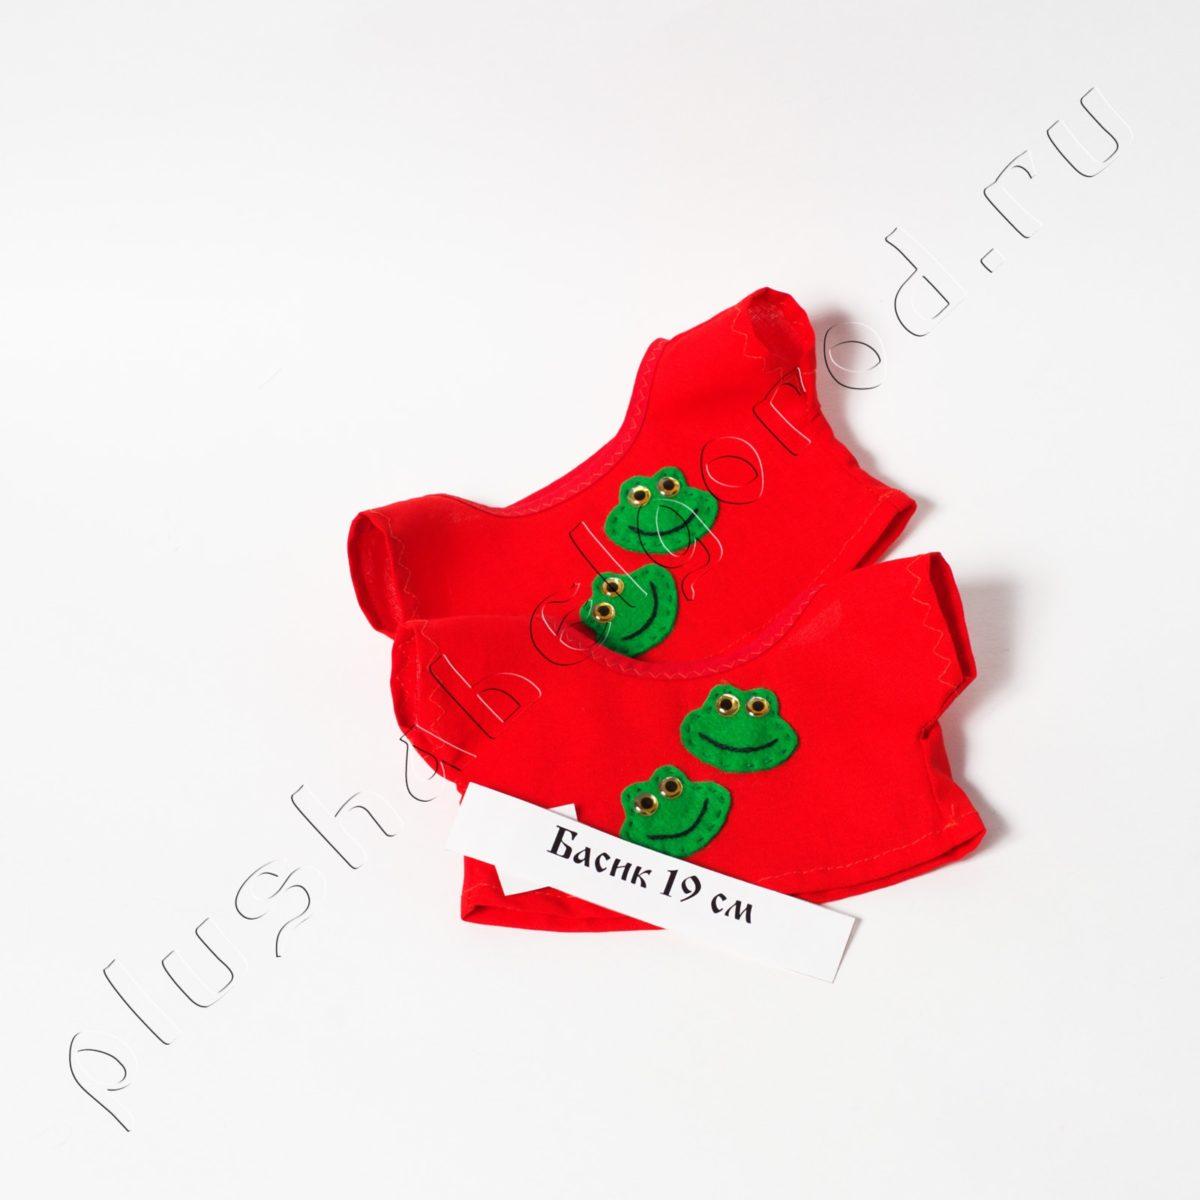 Футболка красная с лягушками для 19 см, цена за шт.